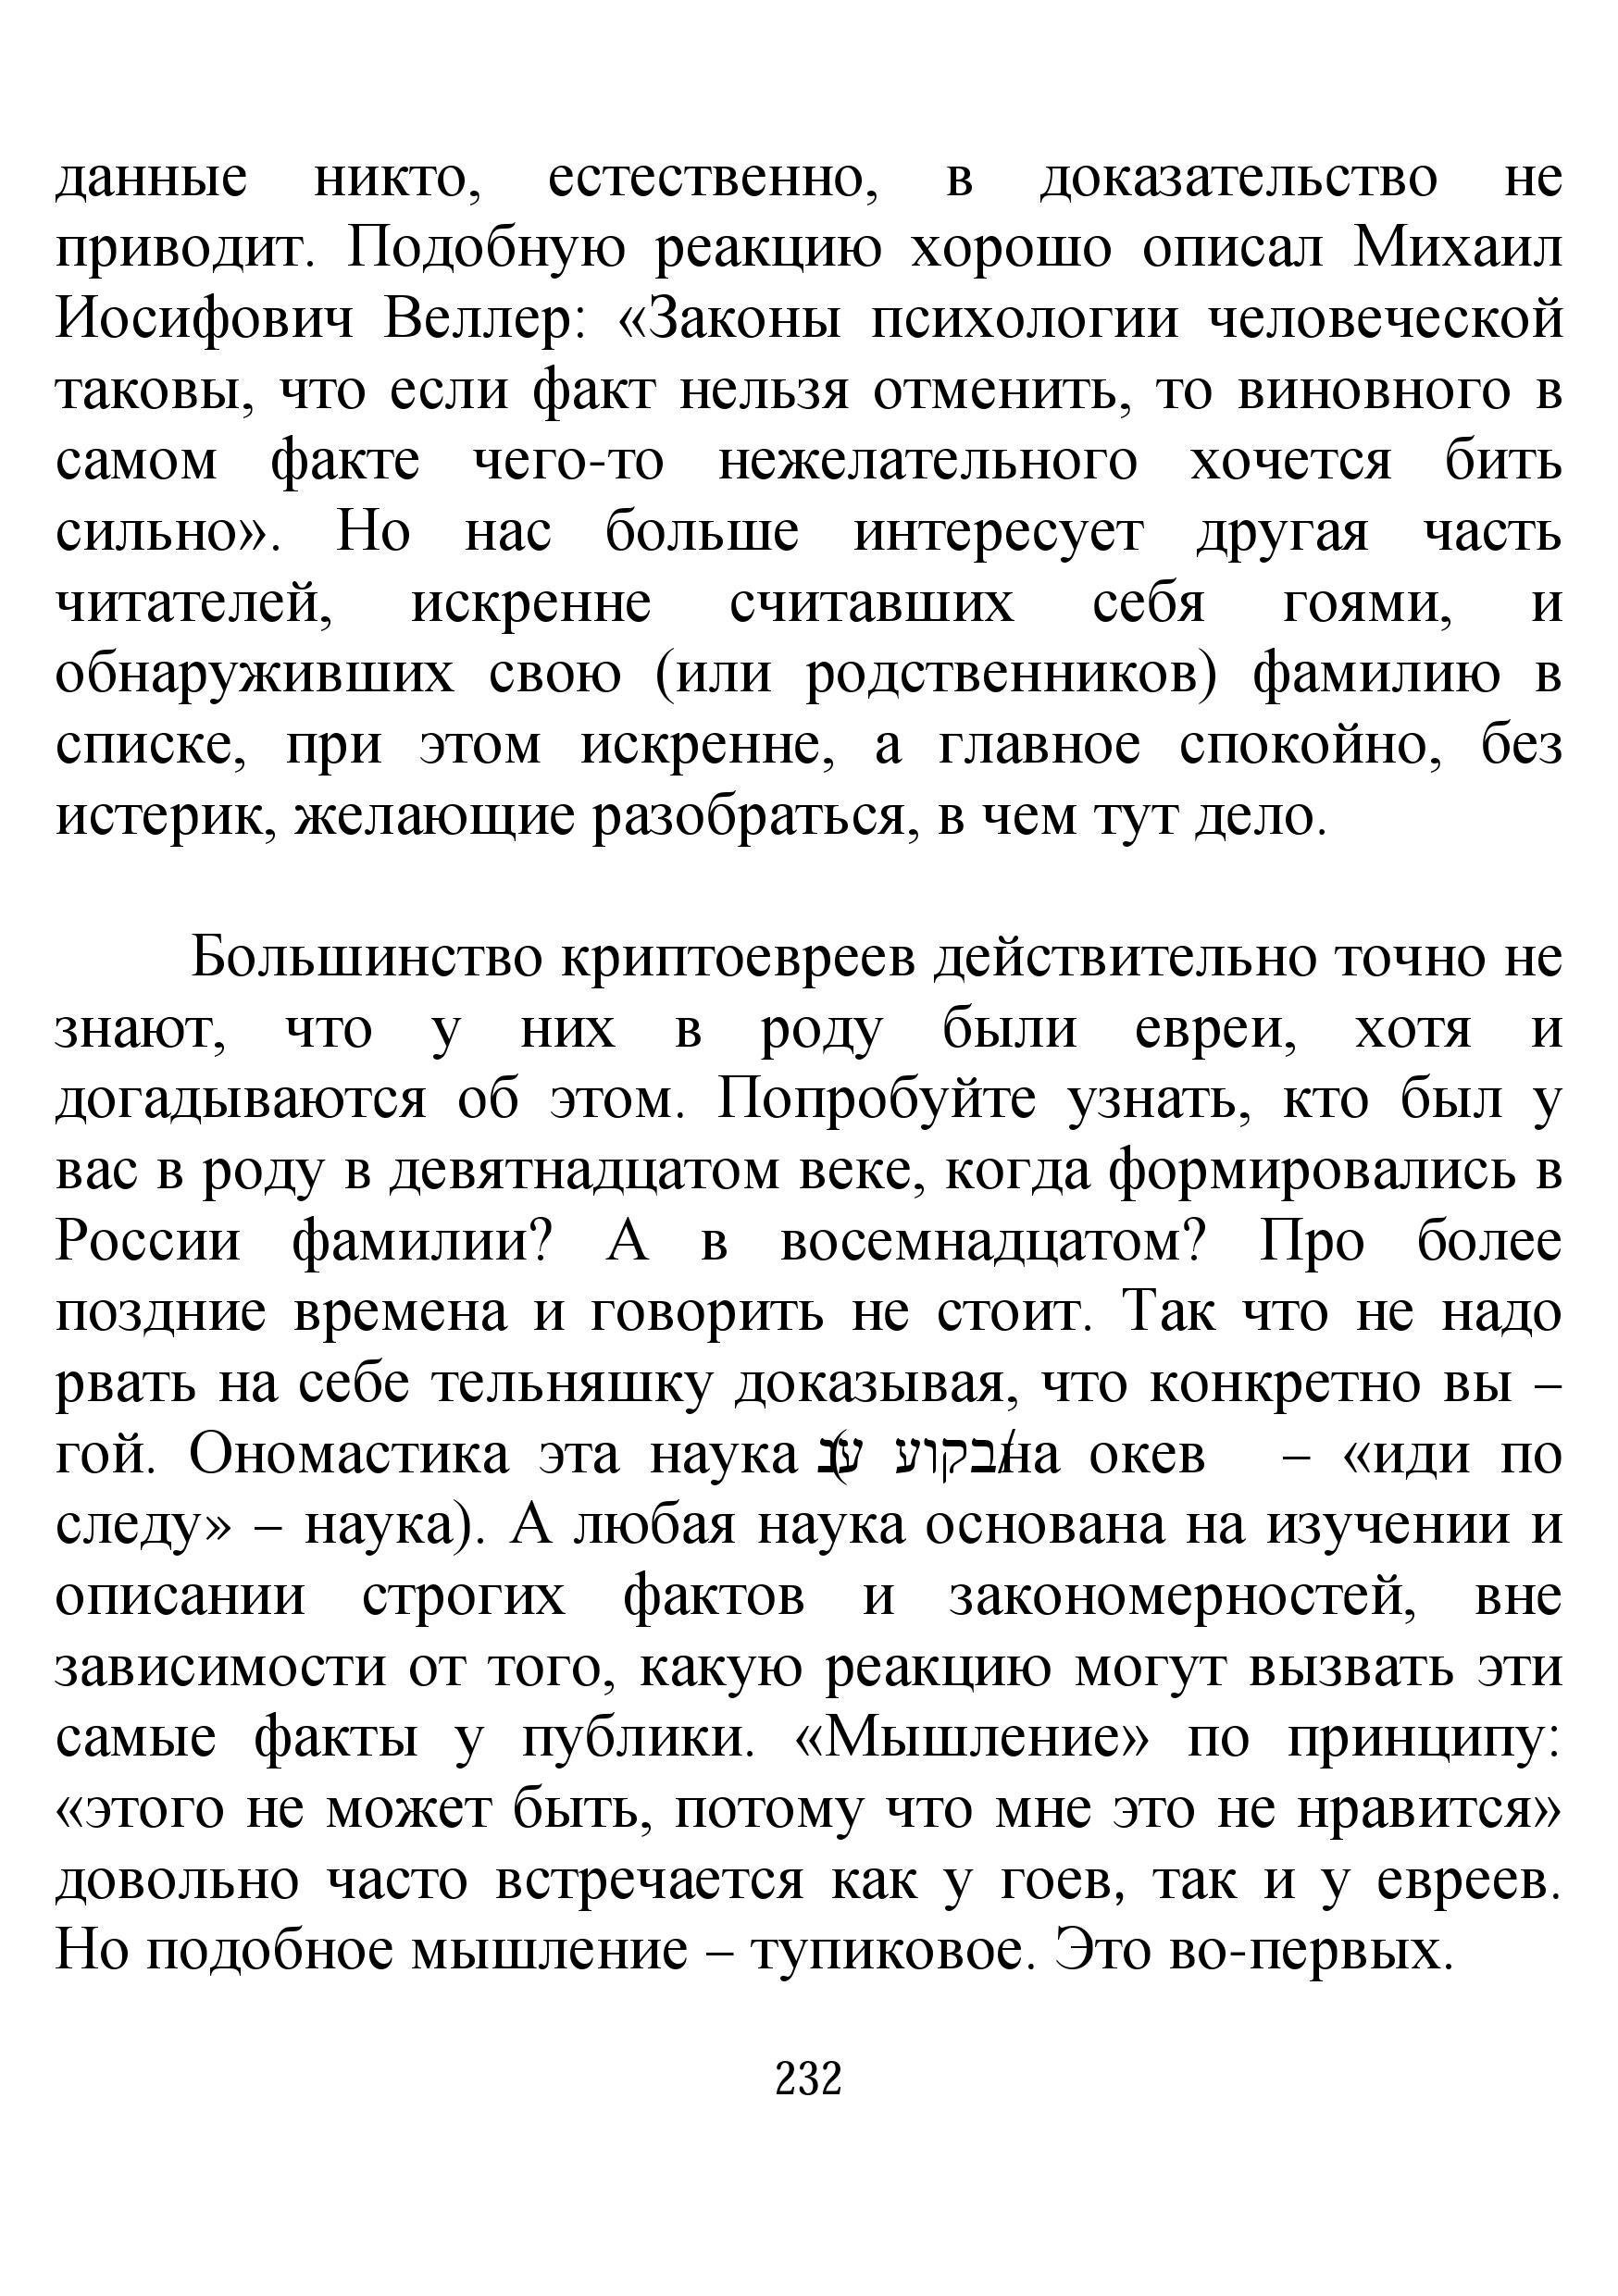 http://s6.uploads.ru/MjBkO.jpg